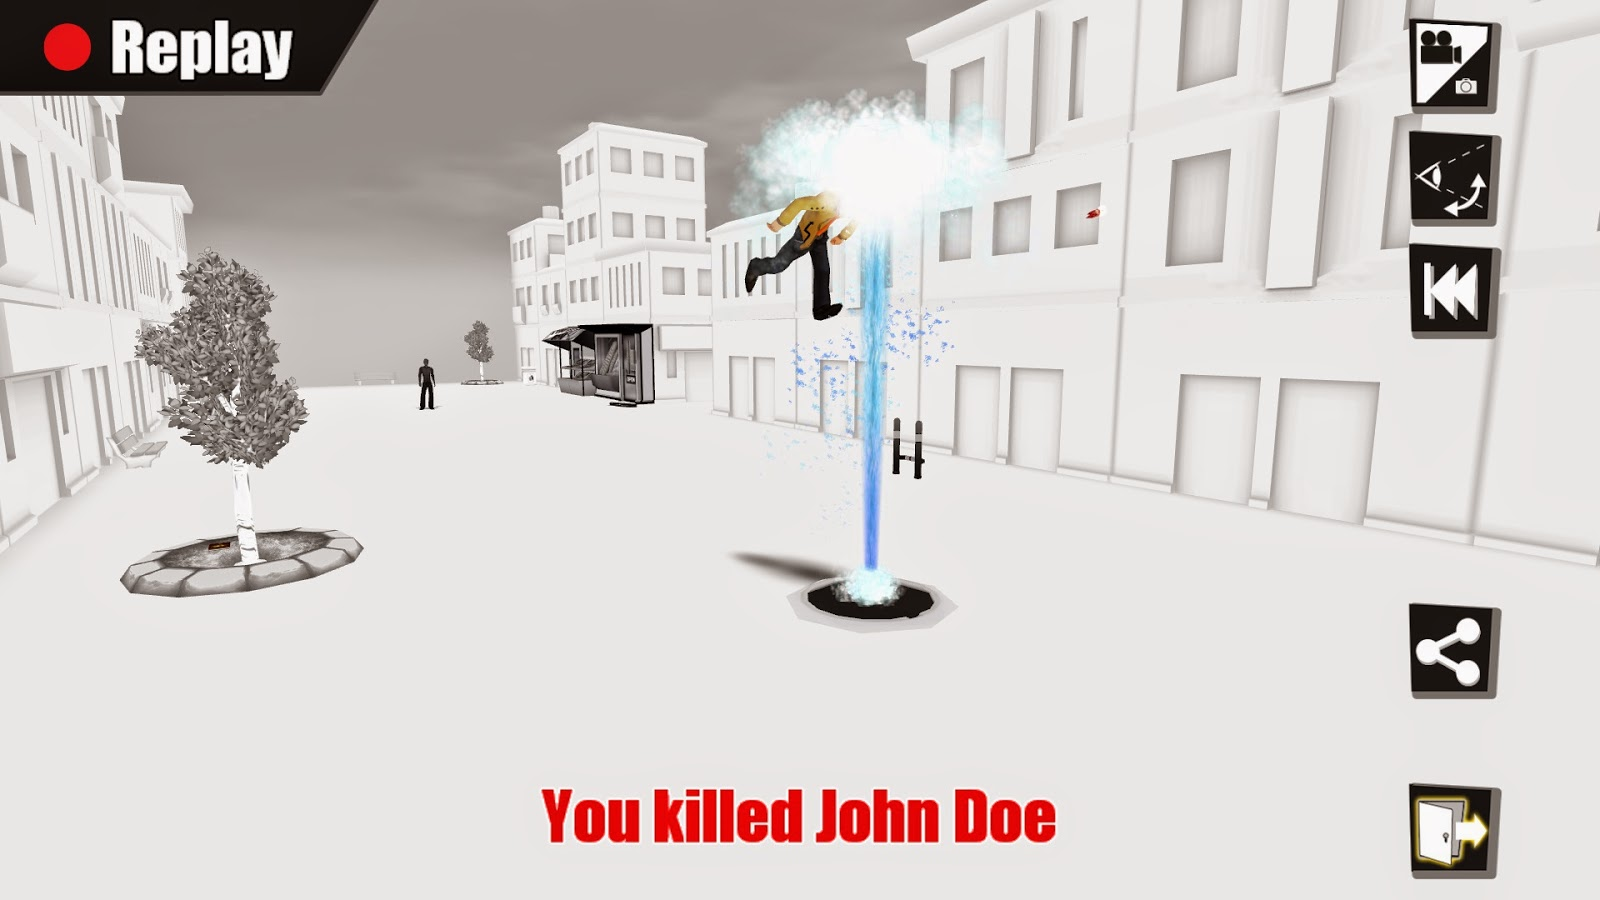 Kill the bad guy game kickstarter screenshot